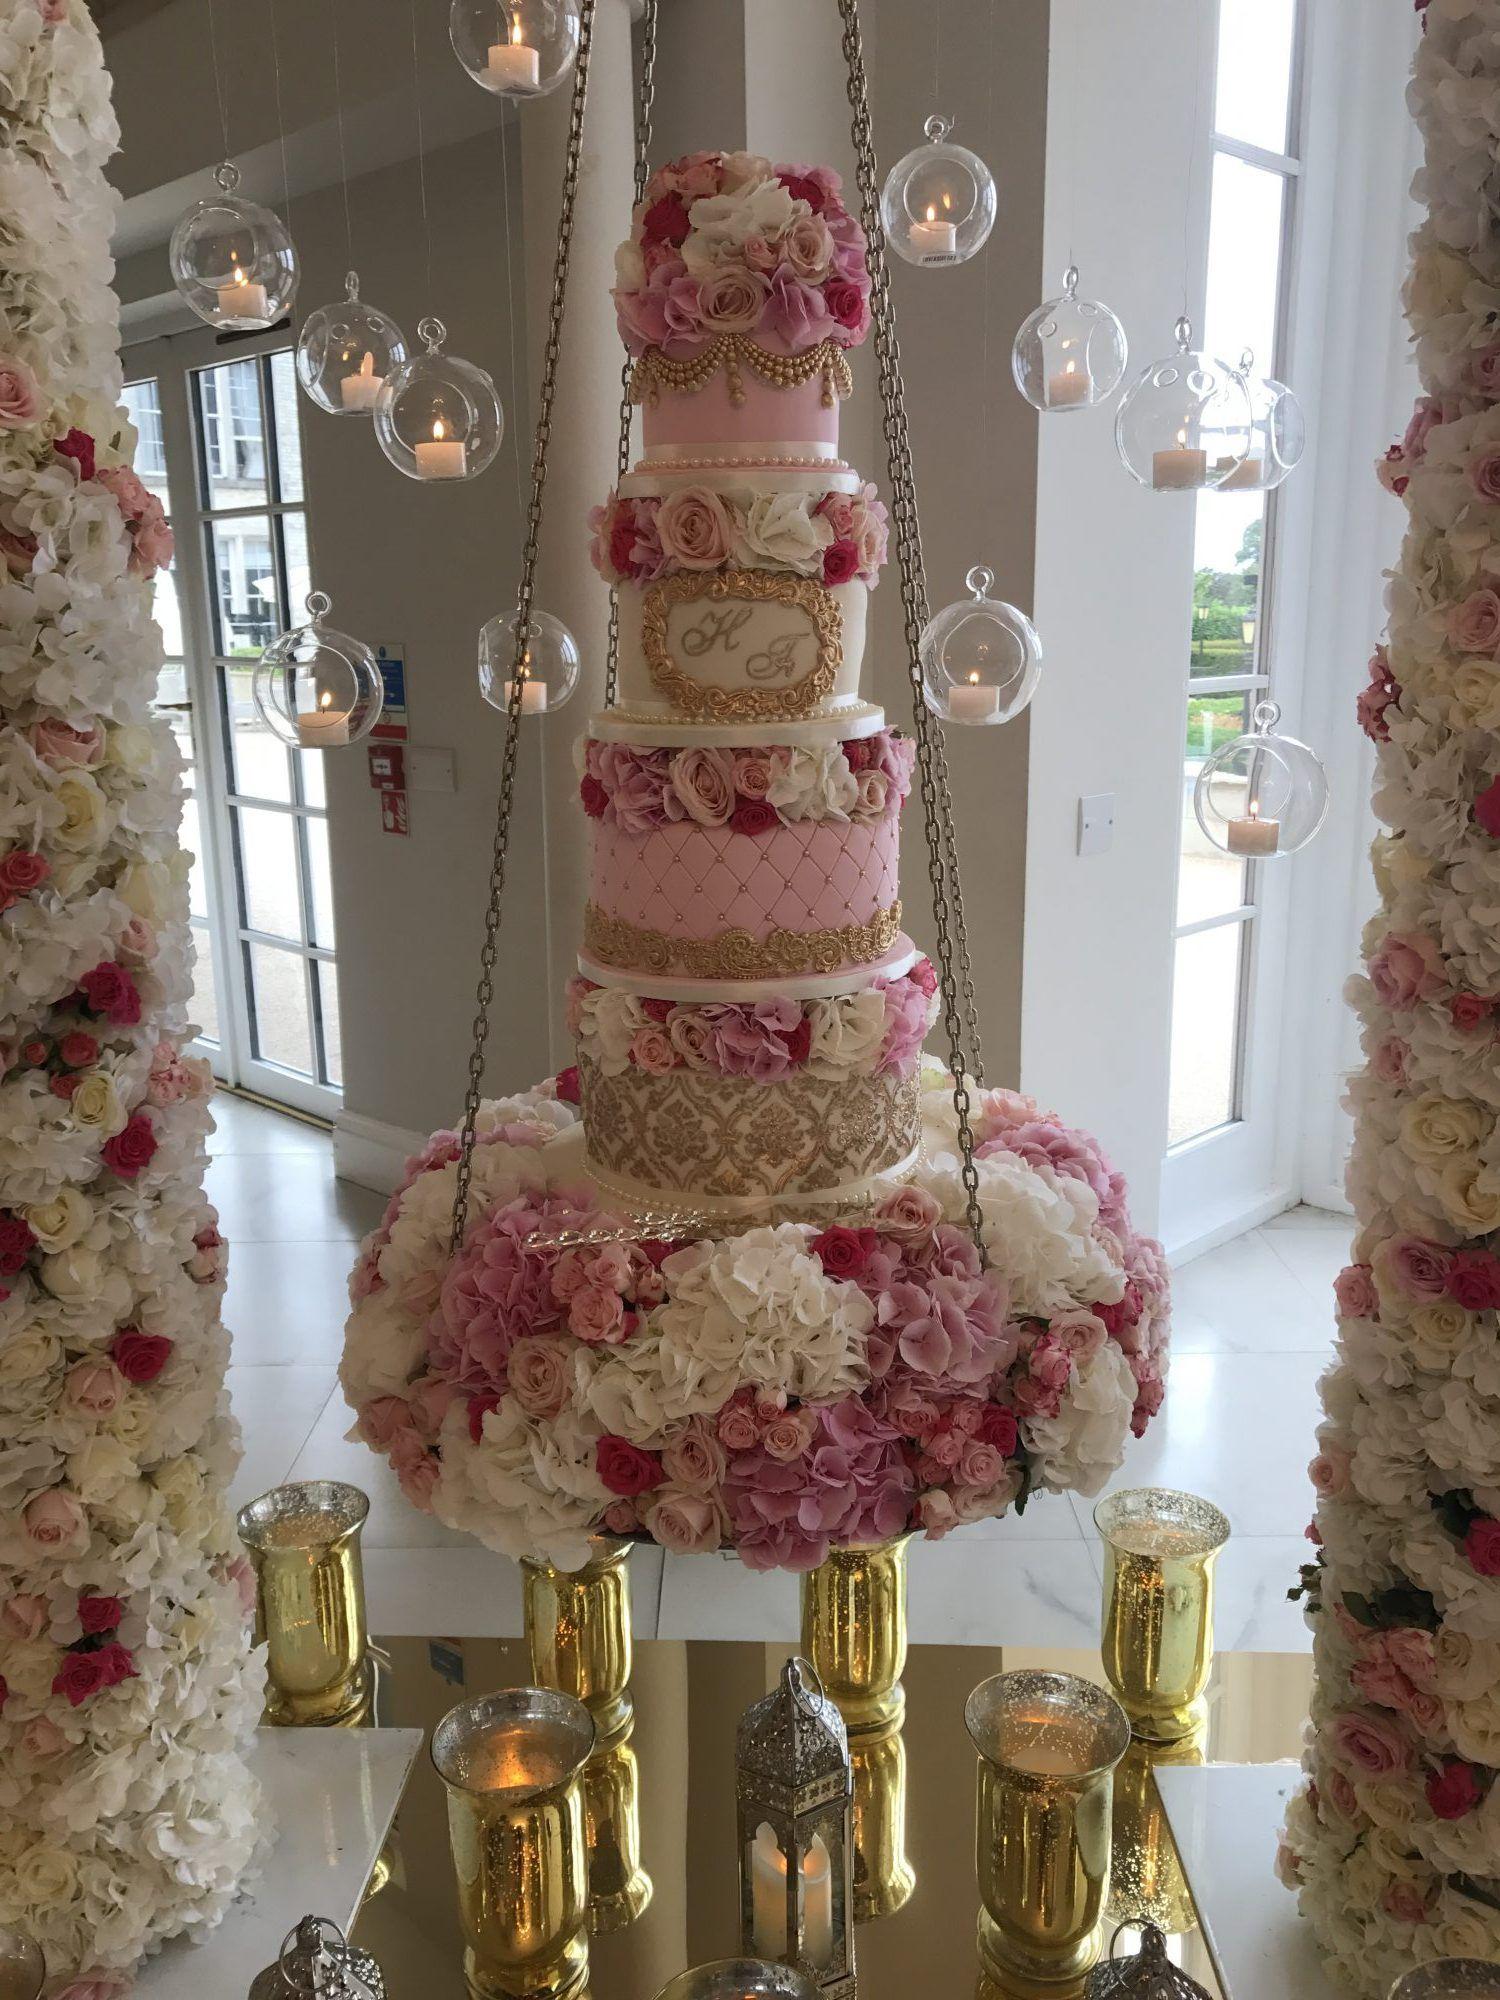 Hanging cake 2 hanging cake wedding cakes with flowers